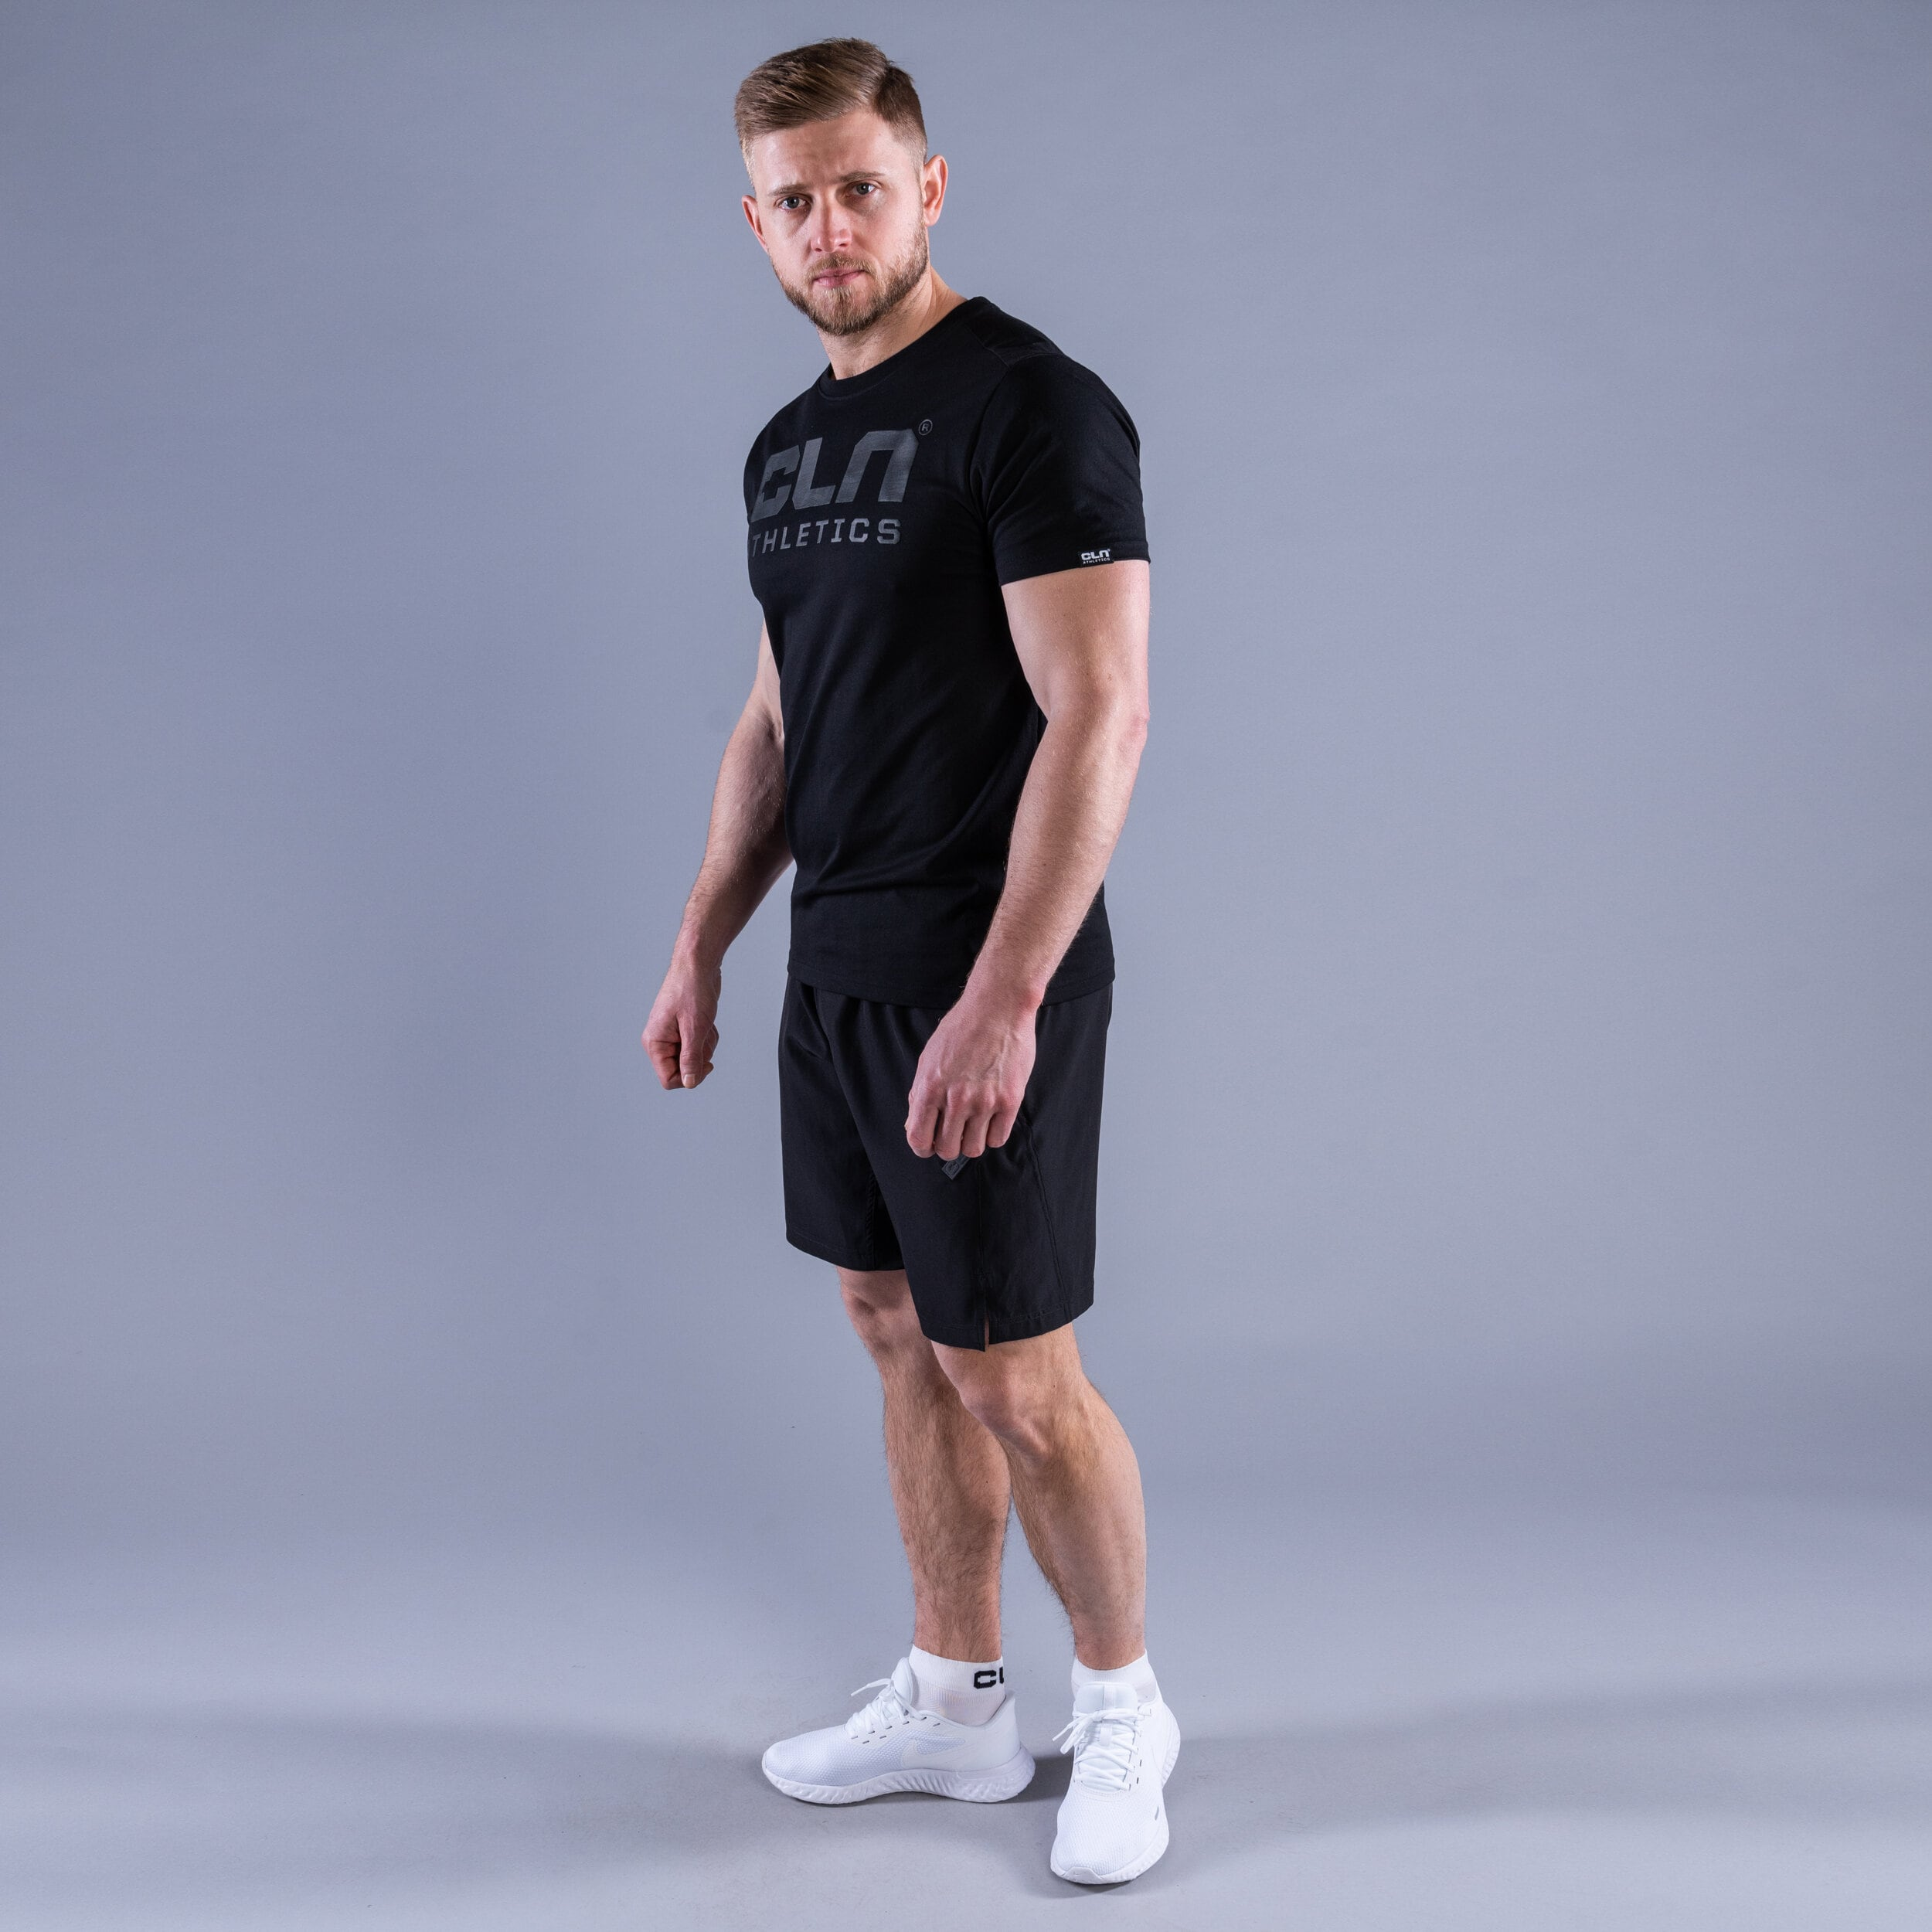 CLN Promo t-shirt Black